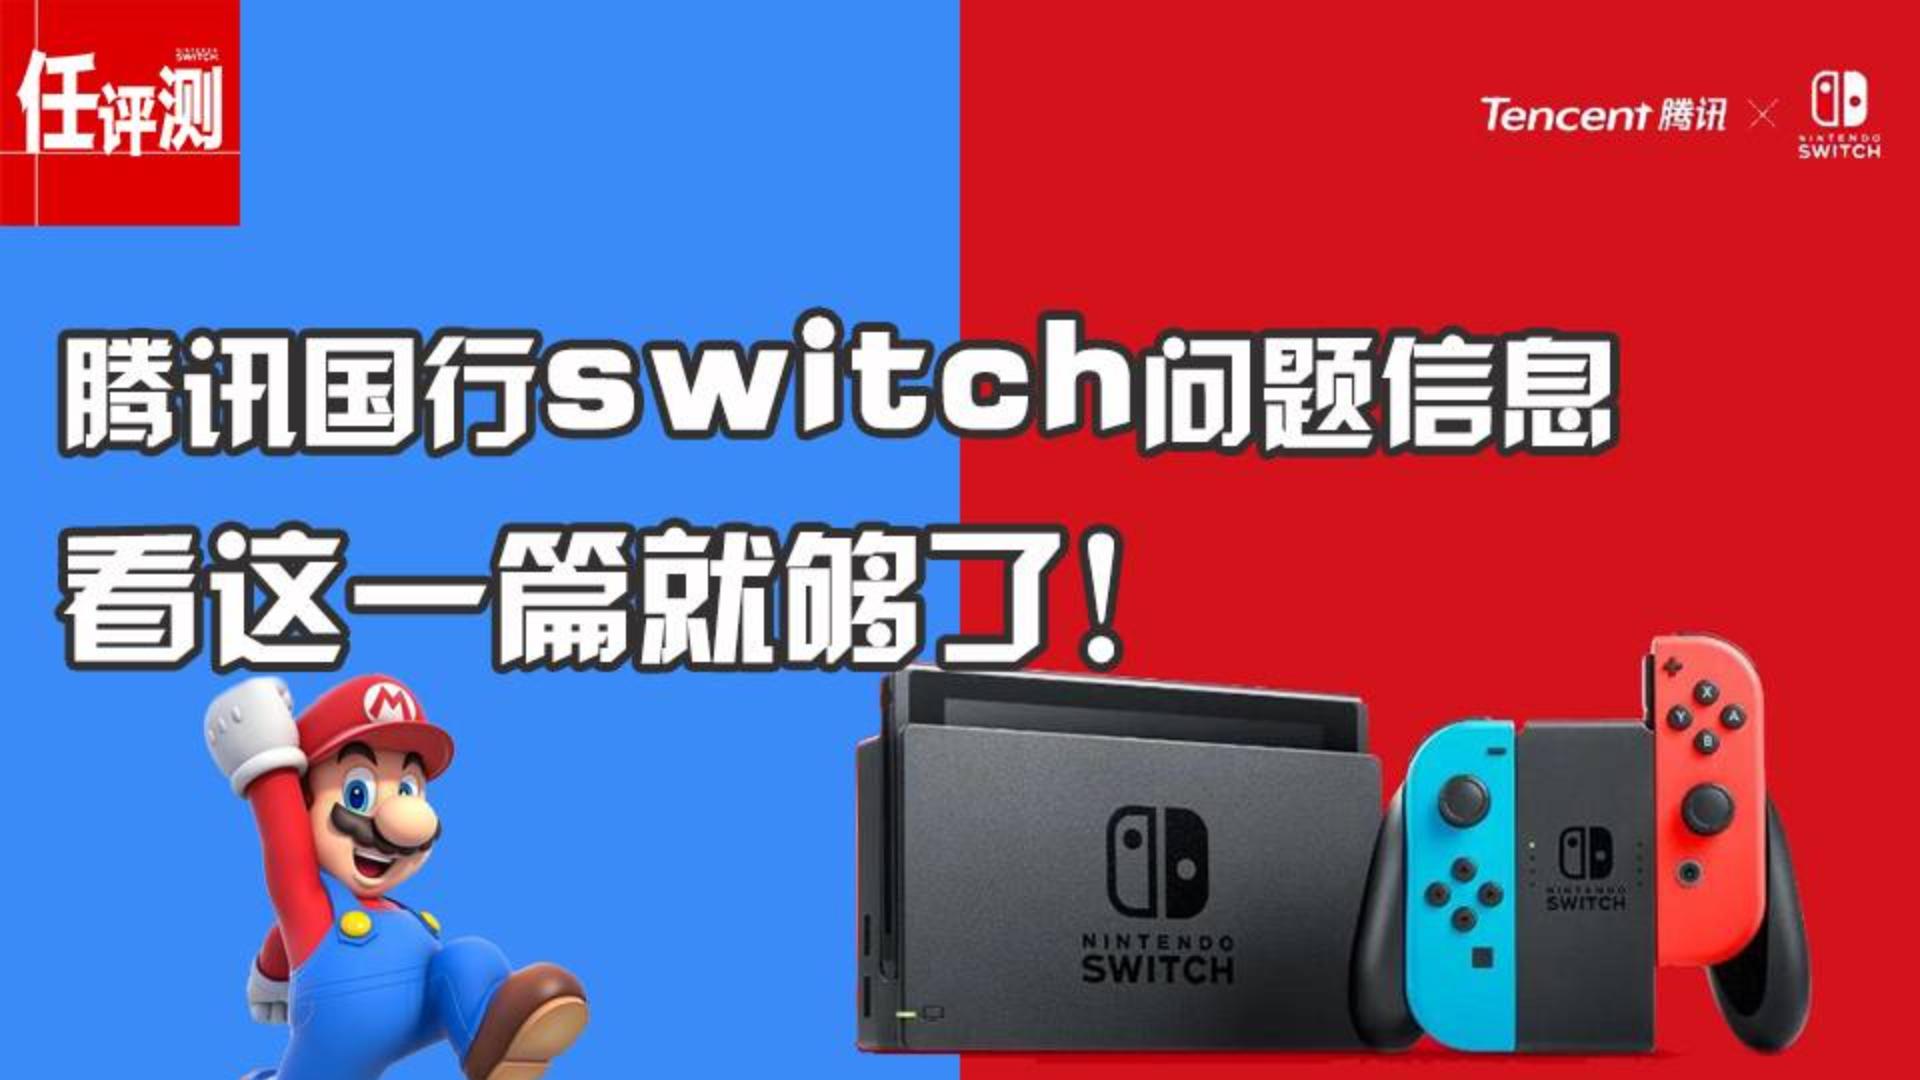 switch国行信息汇总,你想知道的信息都在这里